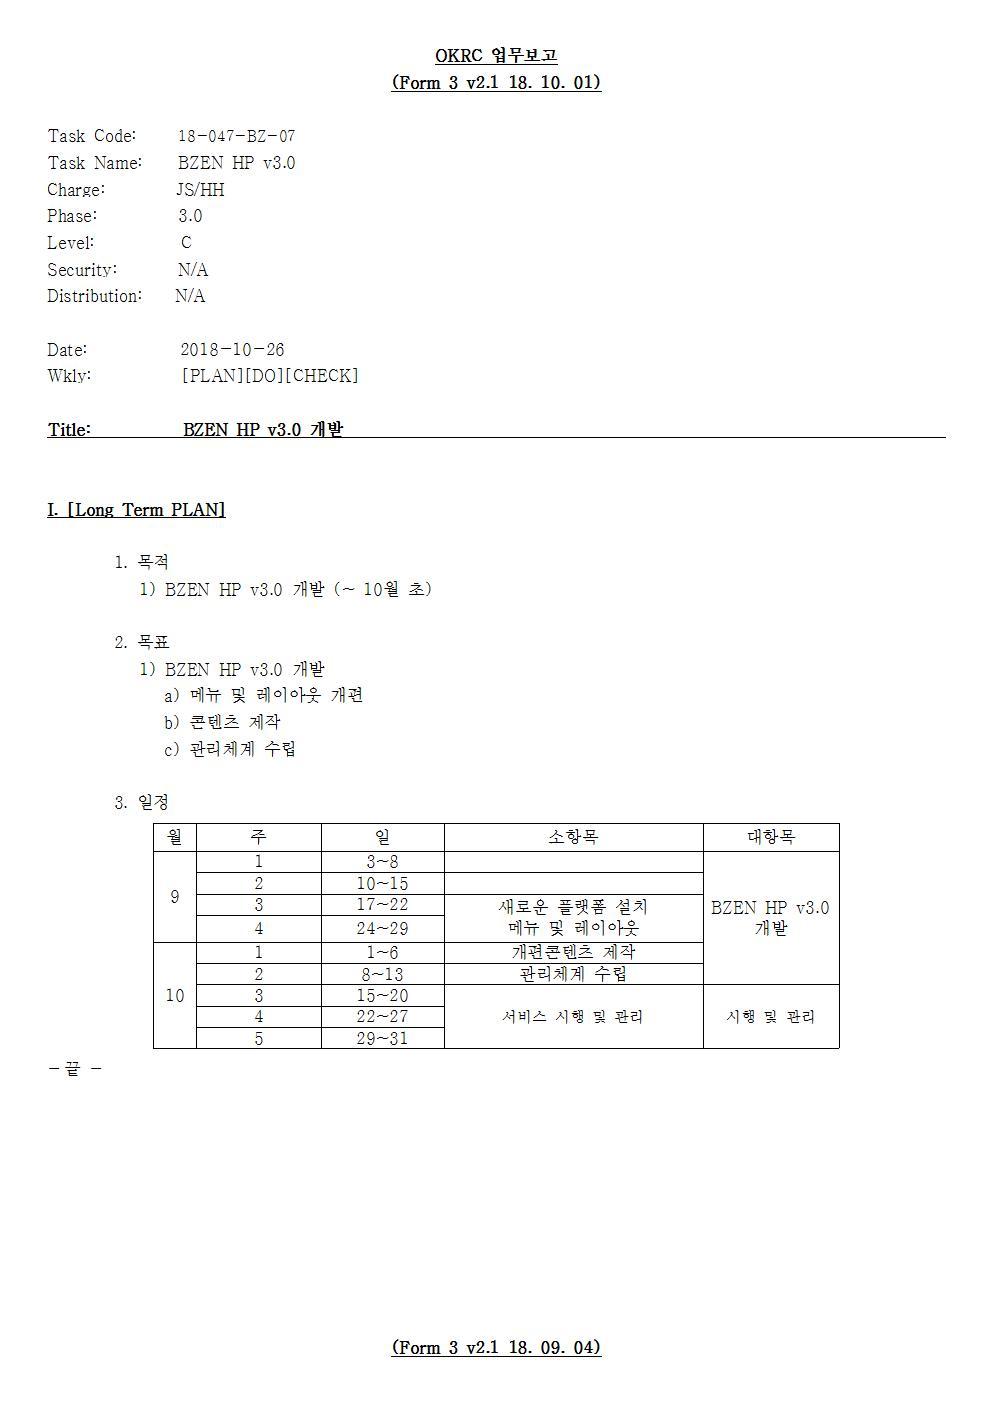 D-[18-047-BZ-07]-[BZEN HP v3.0]-[2018-10-26][HH]001.jpg